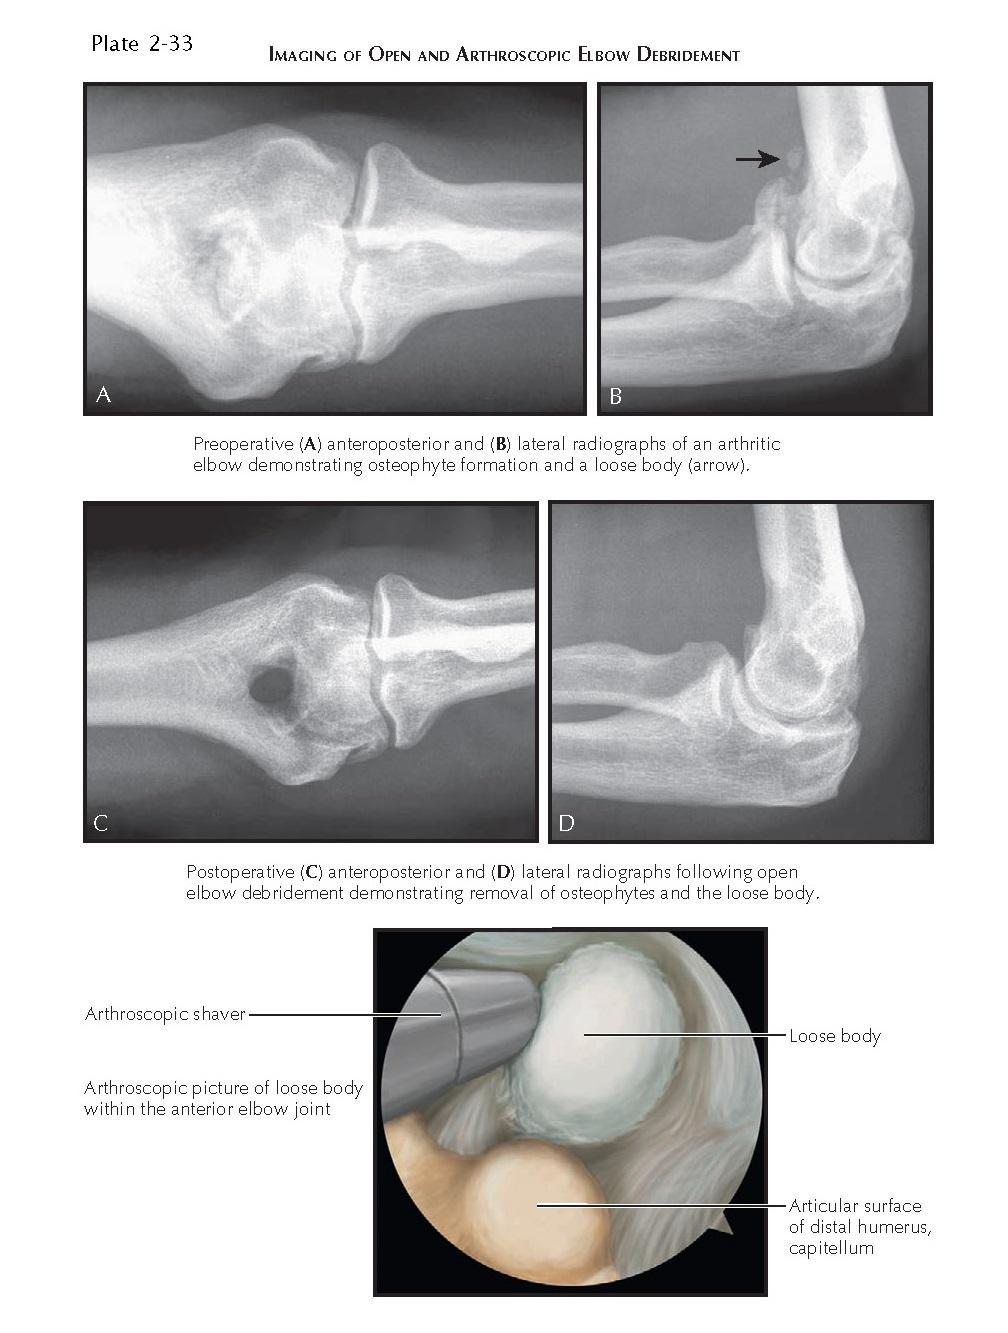 IMAGING OF OPEN AND ARTHROSCOPIC ELBOW DEBRIDEMENT